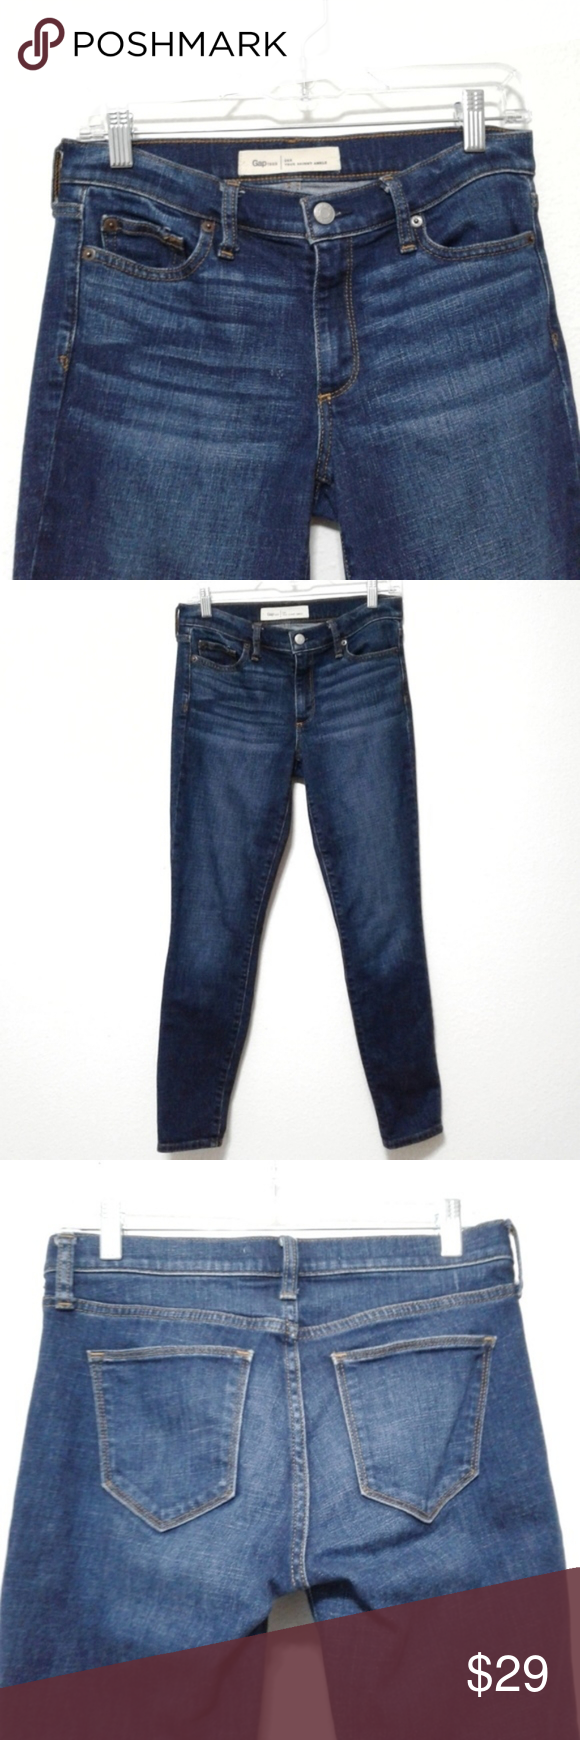 Gap 1969 True Skinny Ankle jeans dark wash 26R Great pre-owned condition. Dark wash Gap true skinny ankle je…   Skinny ankle jeans. Ankle jeans ...